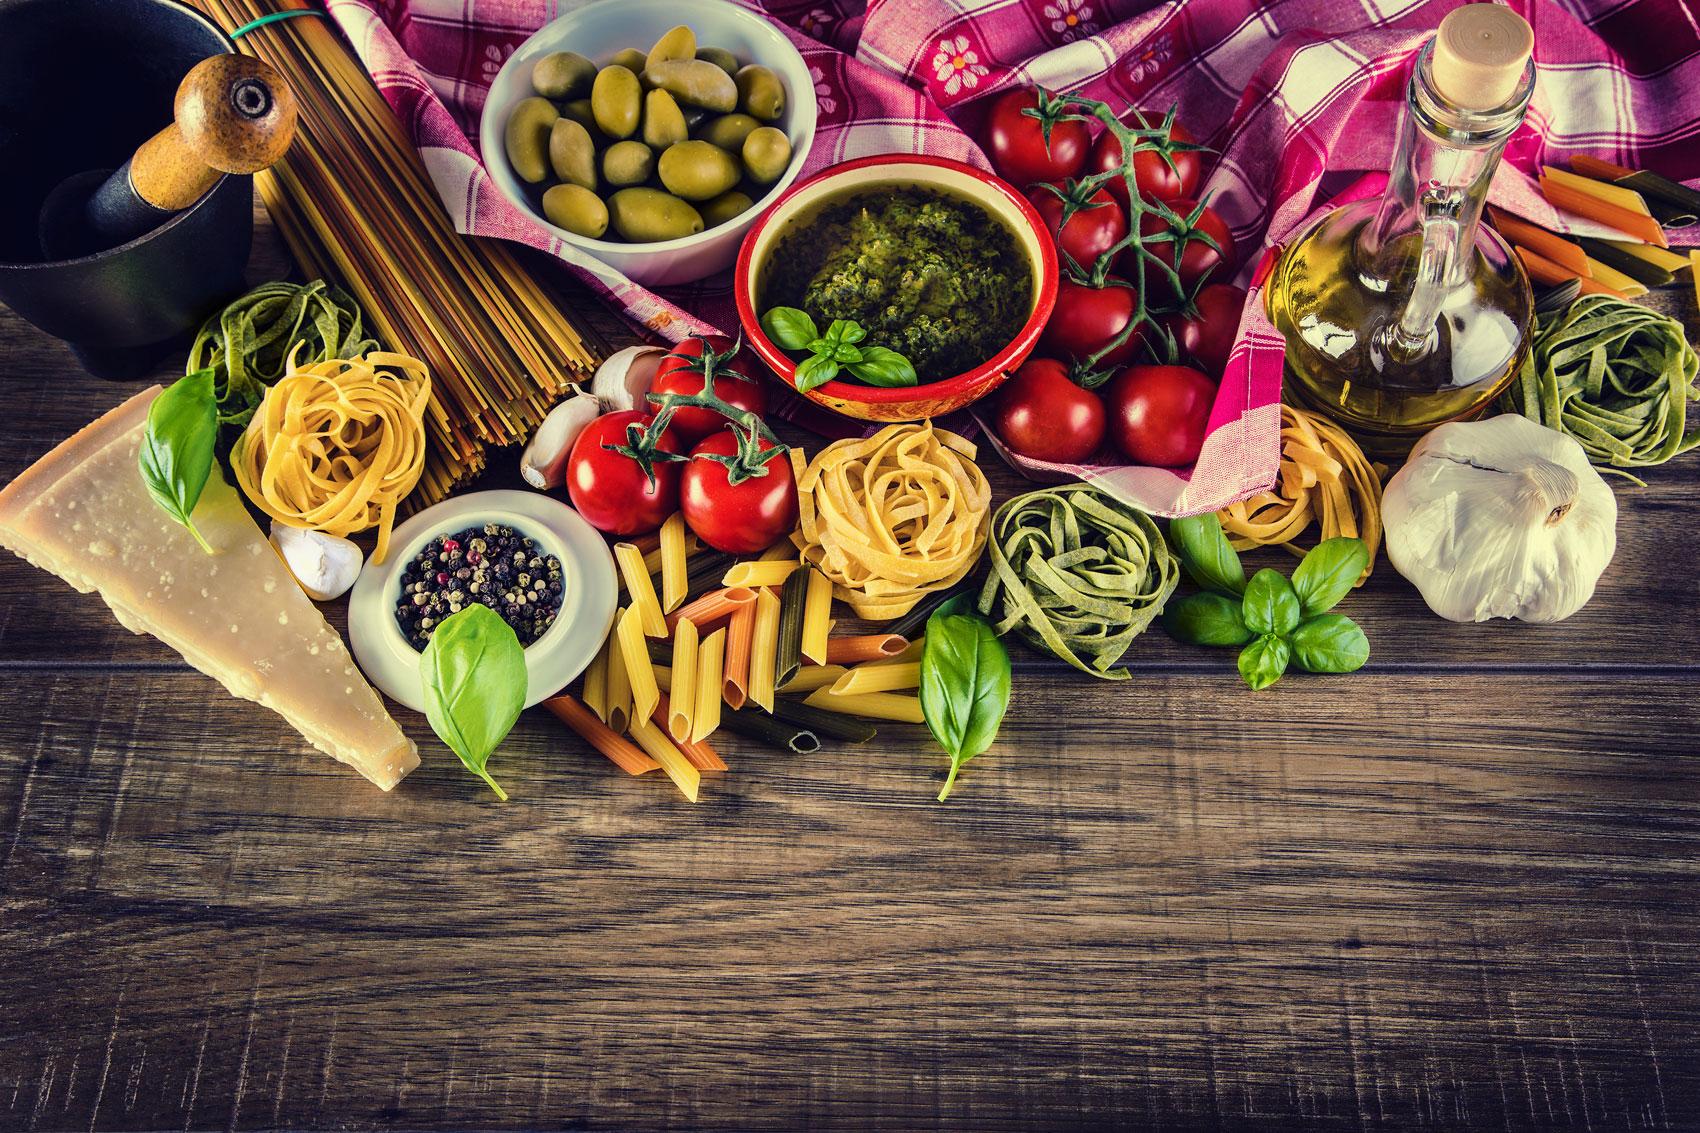 la dieta mediterranea fa dimagrire